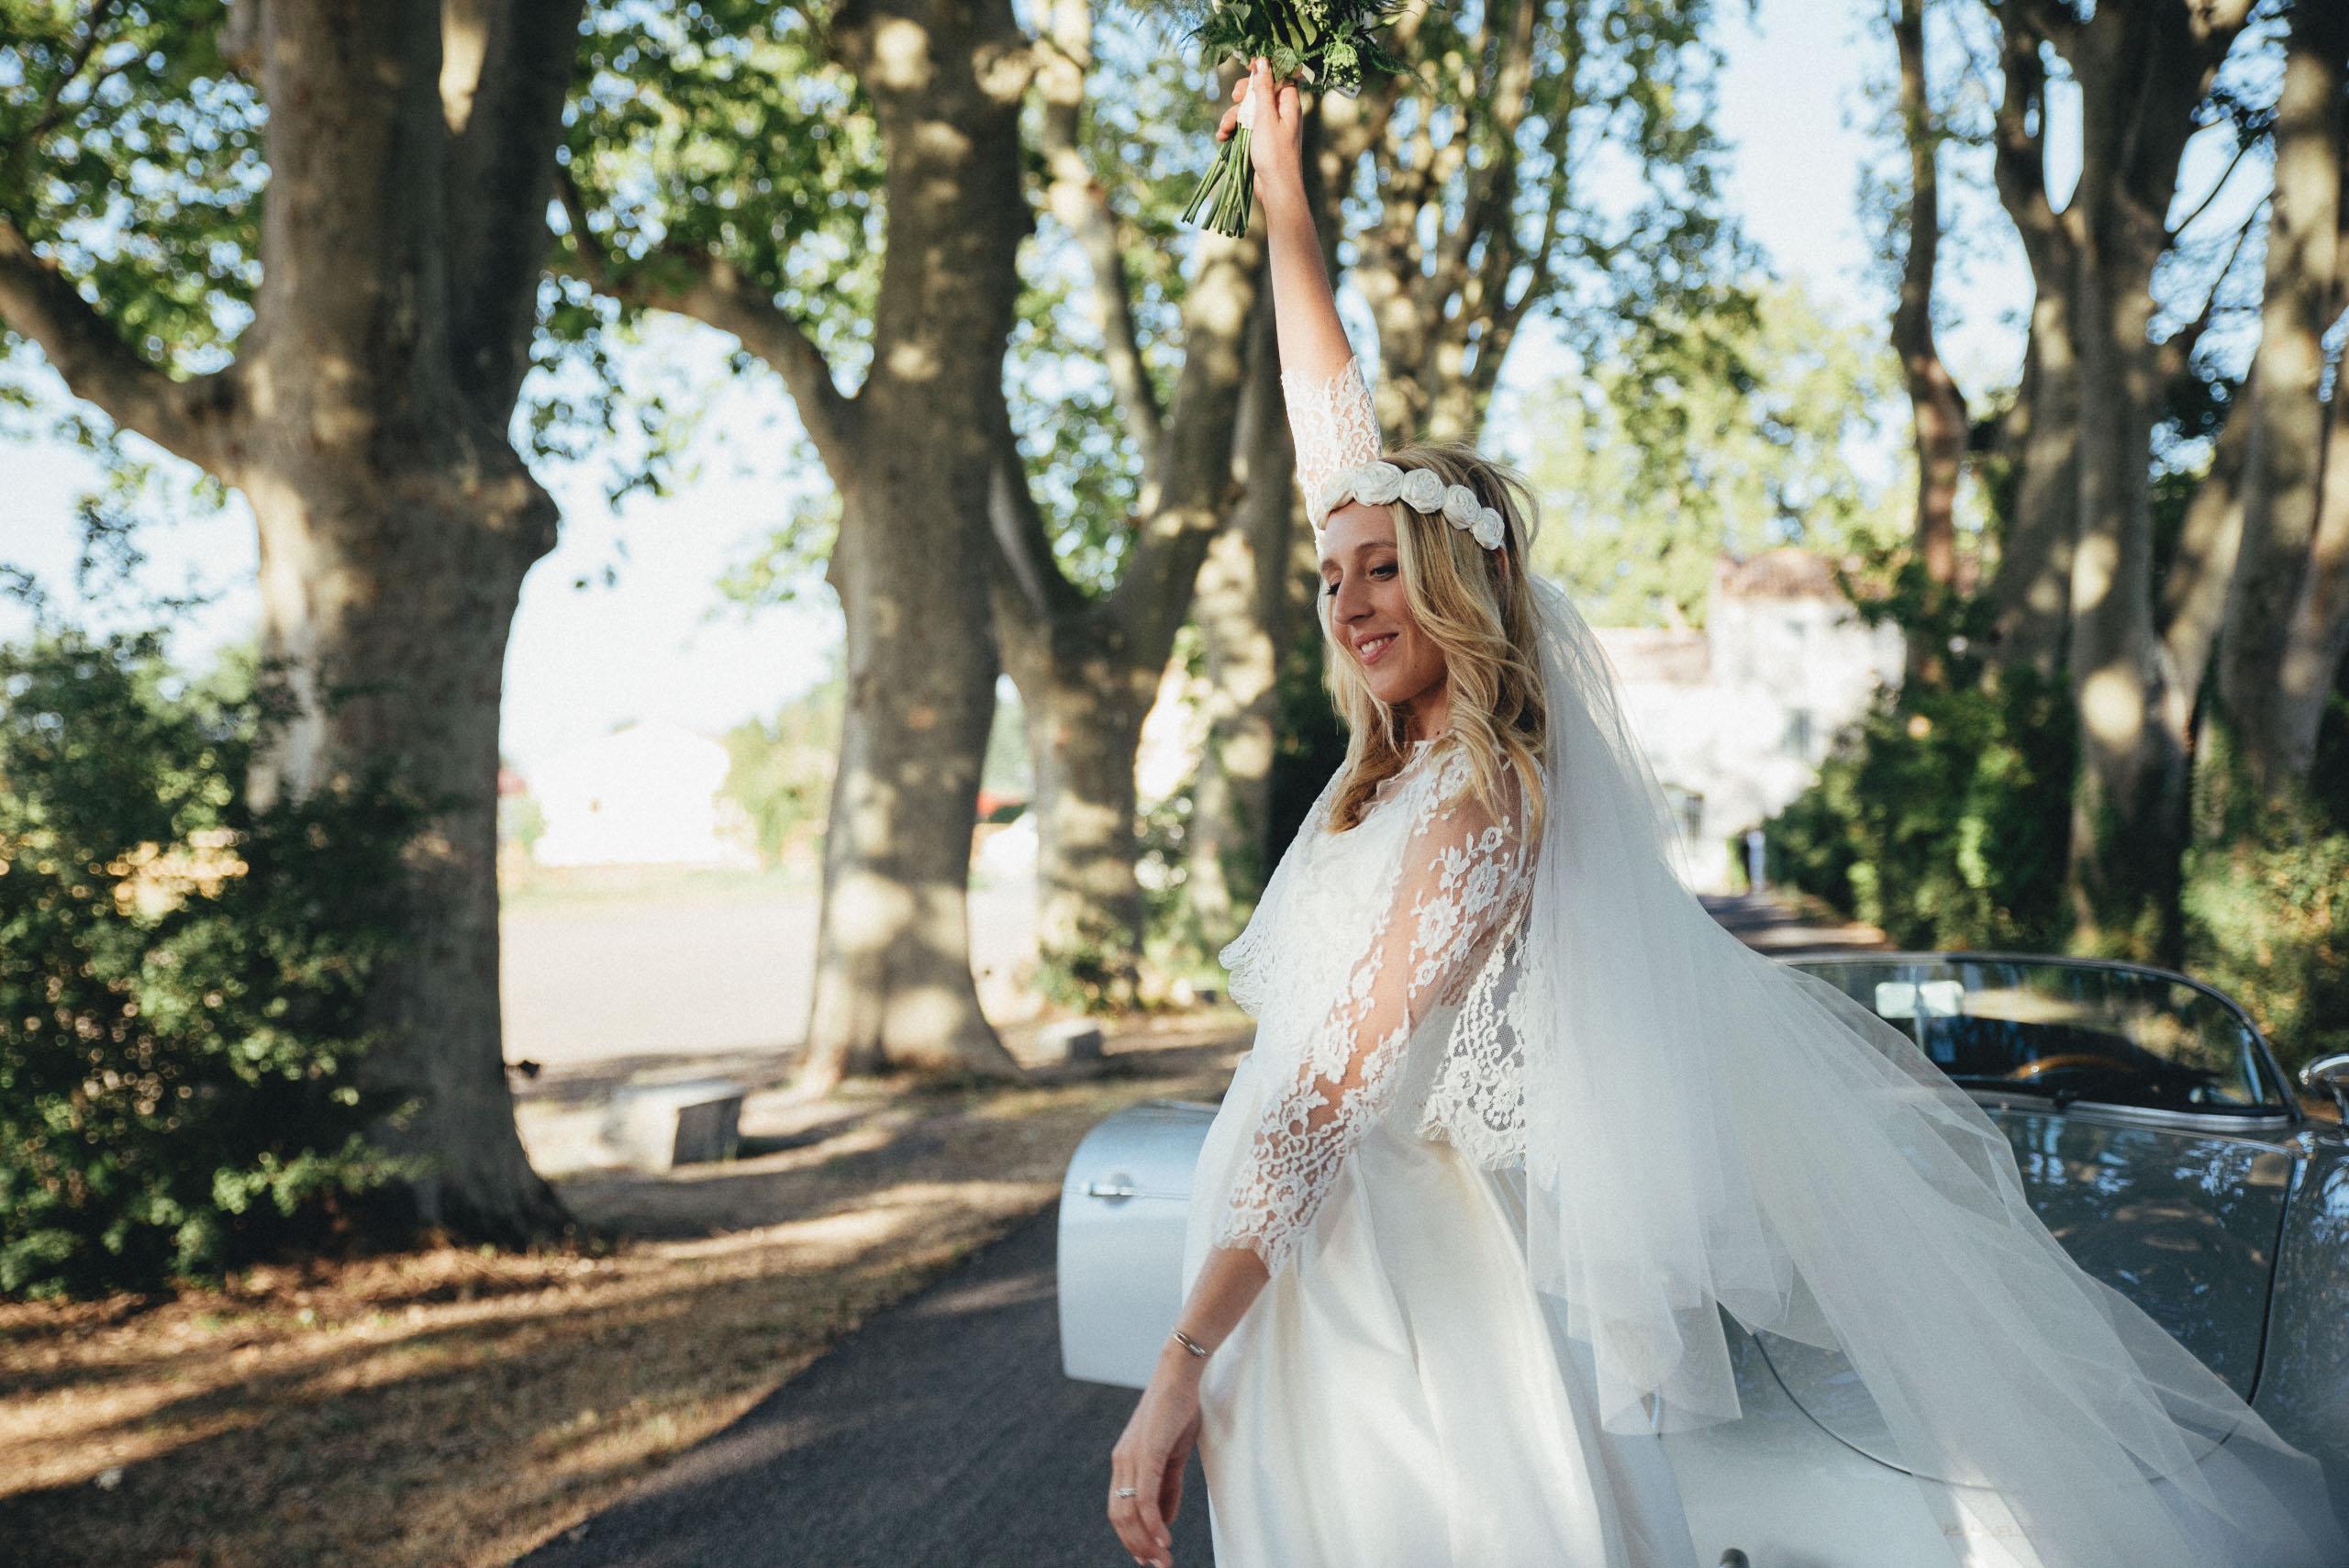 Mariage C & A Photographe © Monsieur + Madame - Robe © Rue de Seine/Olympe - Lieu © Mas Merlet